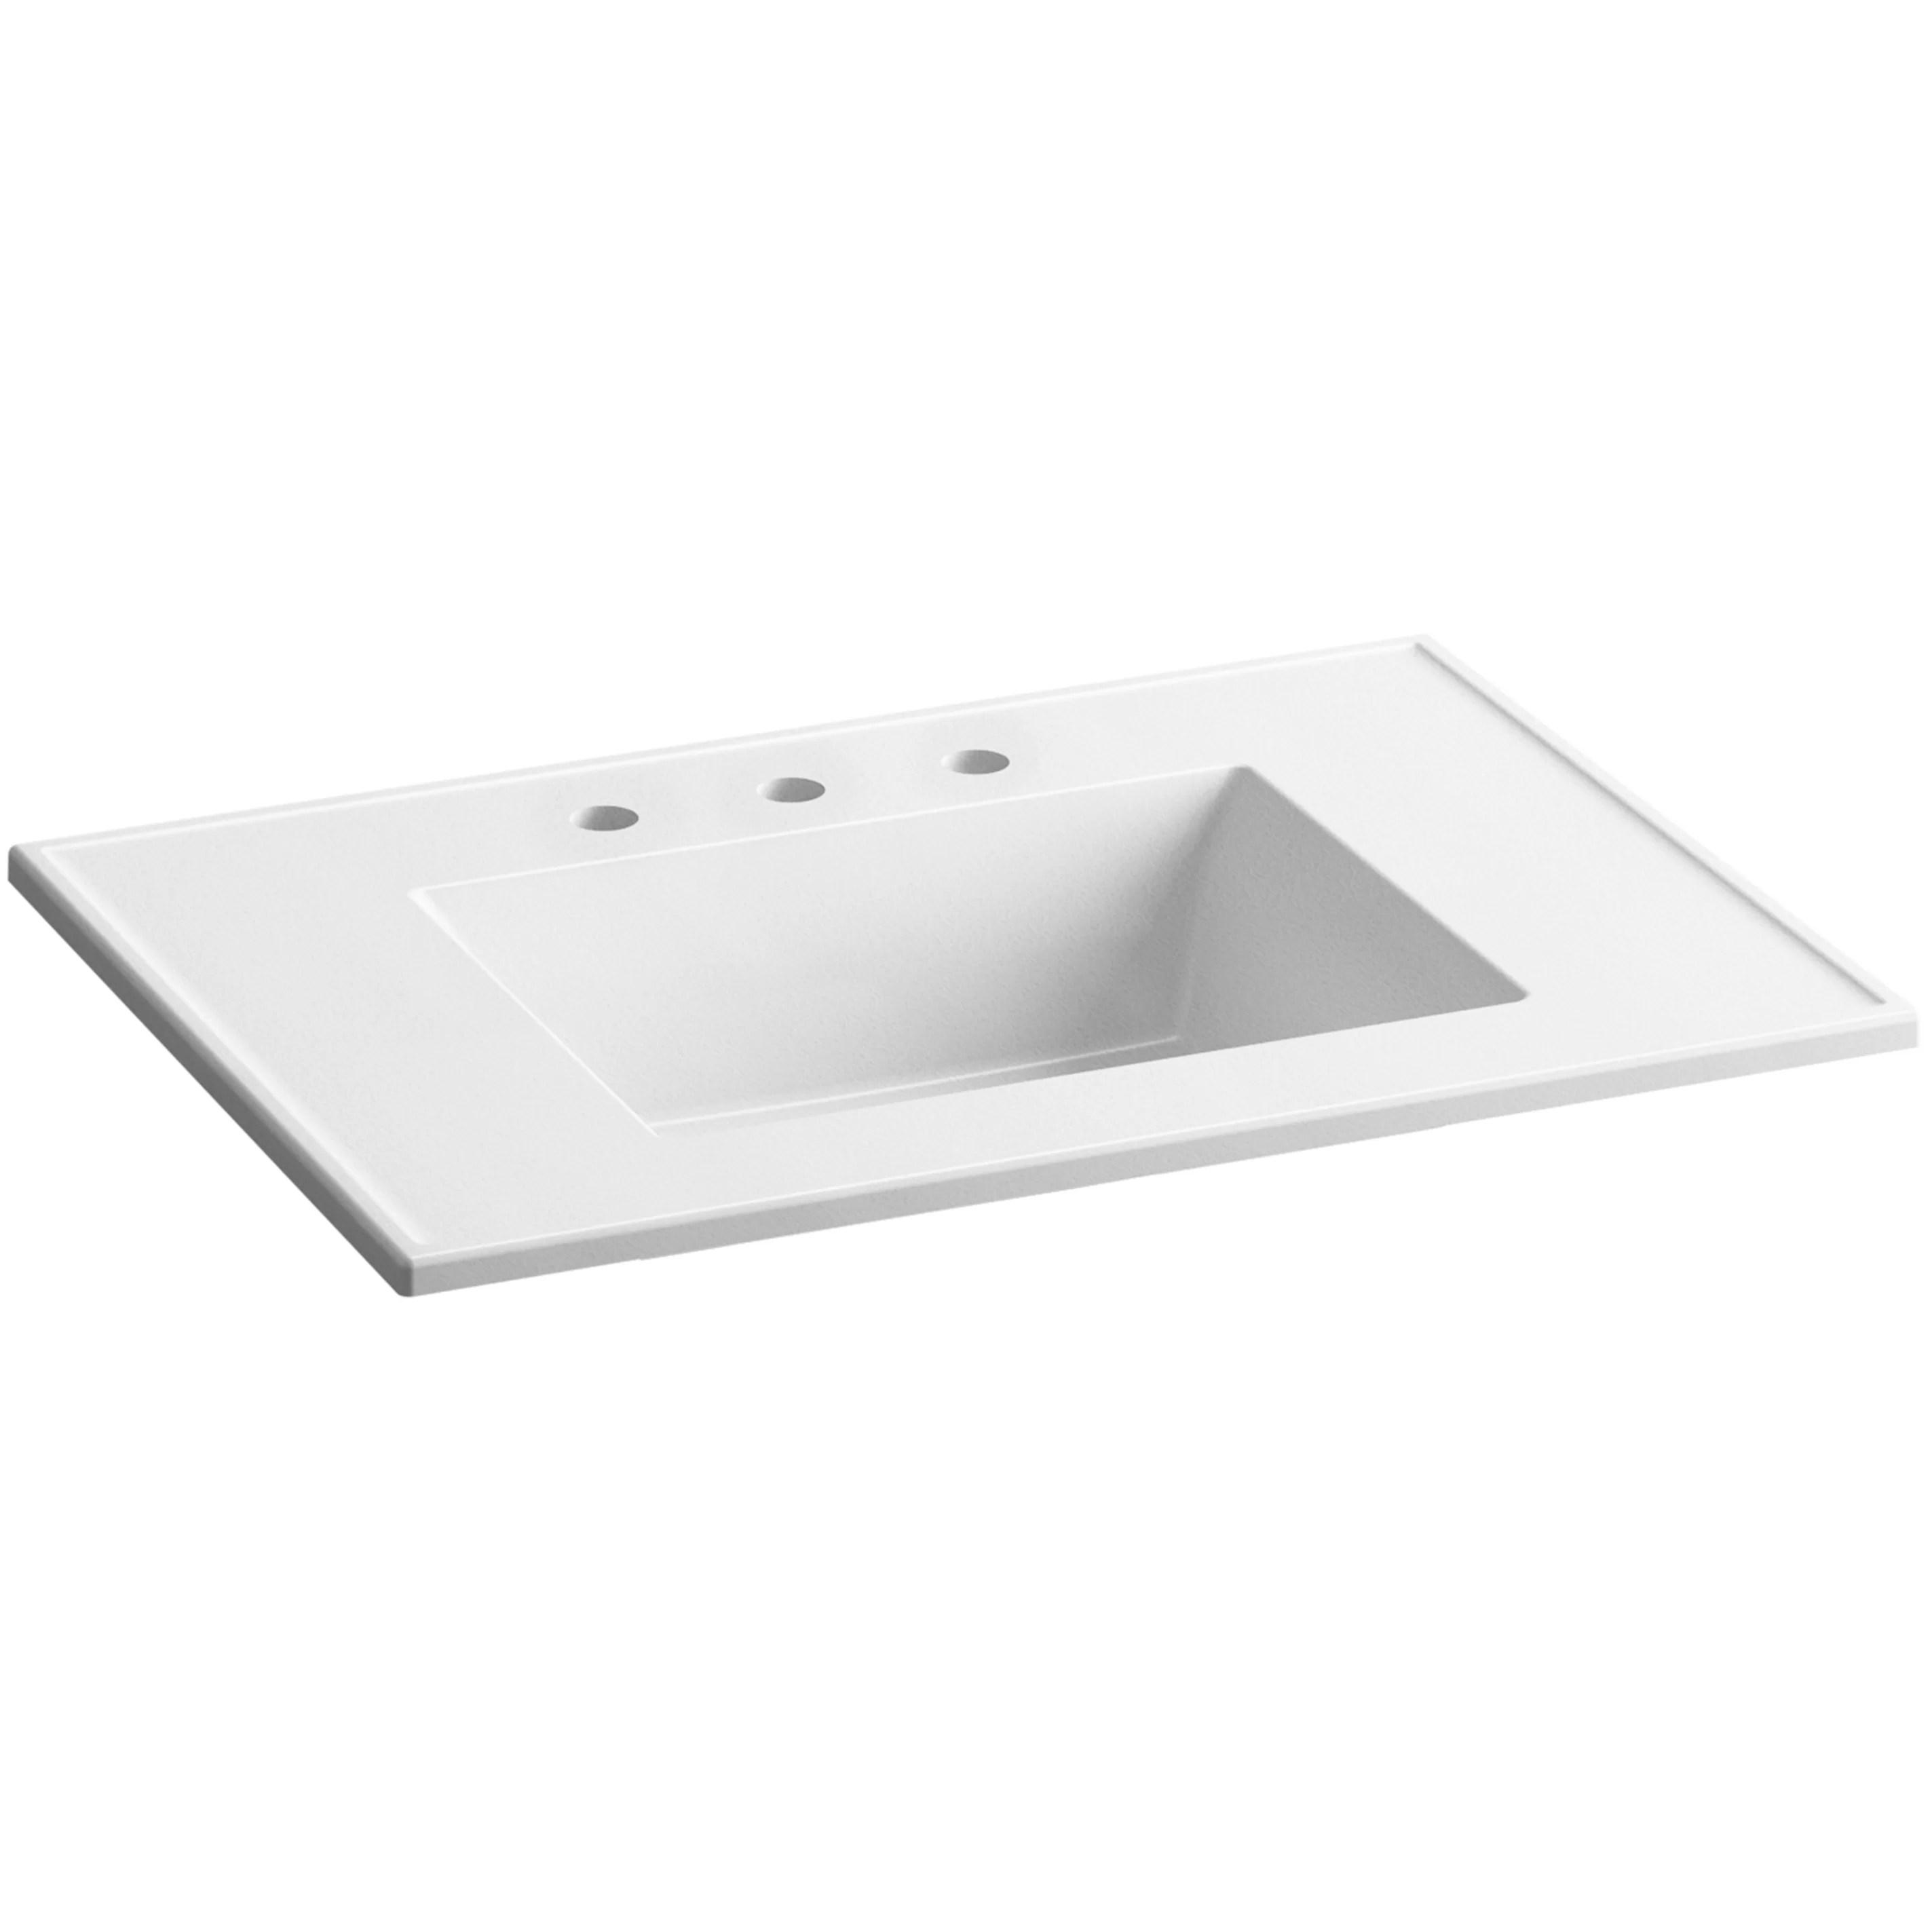 Vanity Tops With Sink Asmallnation